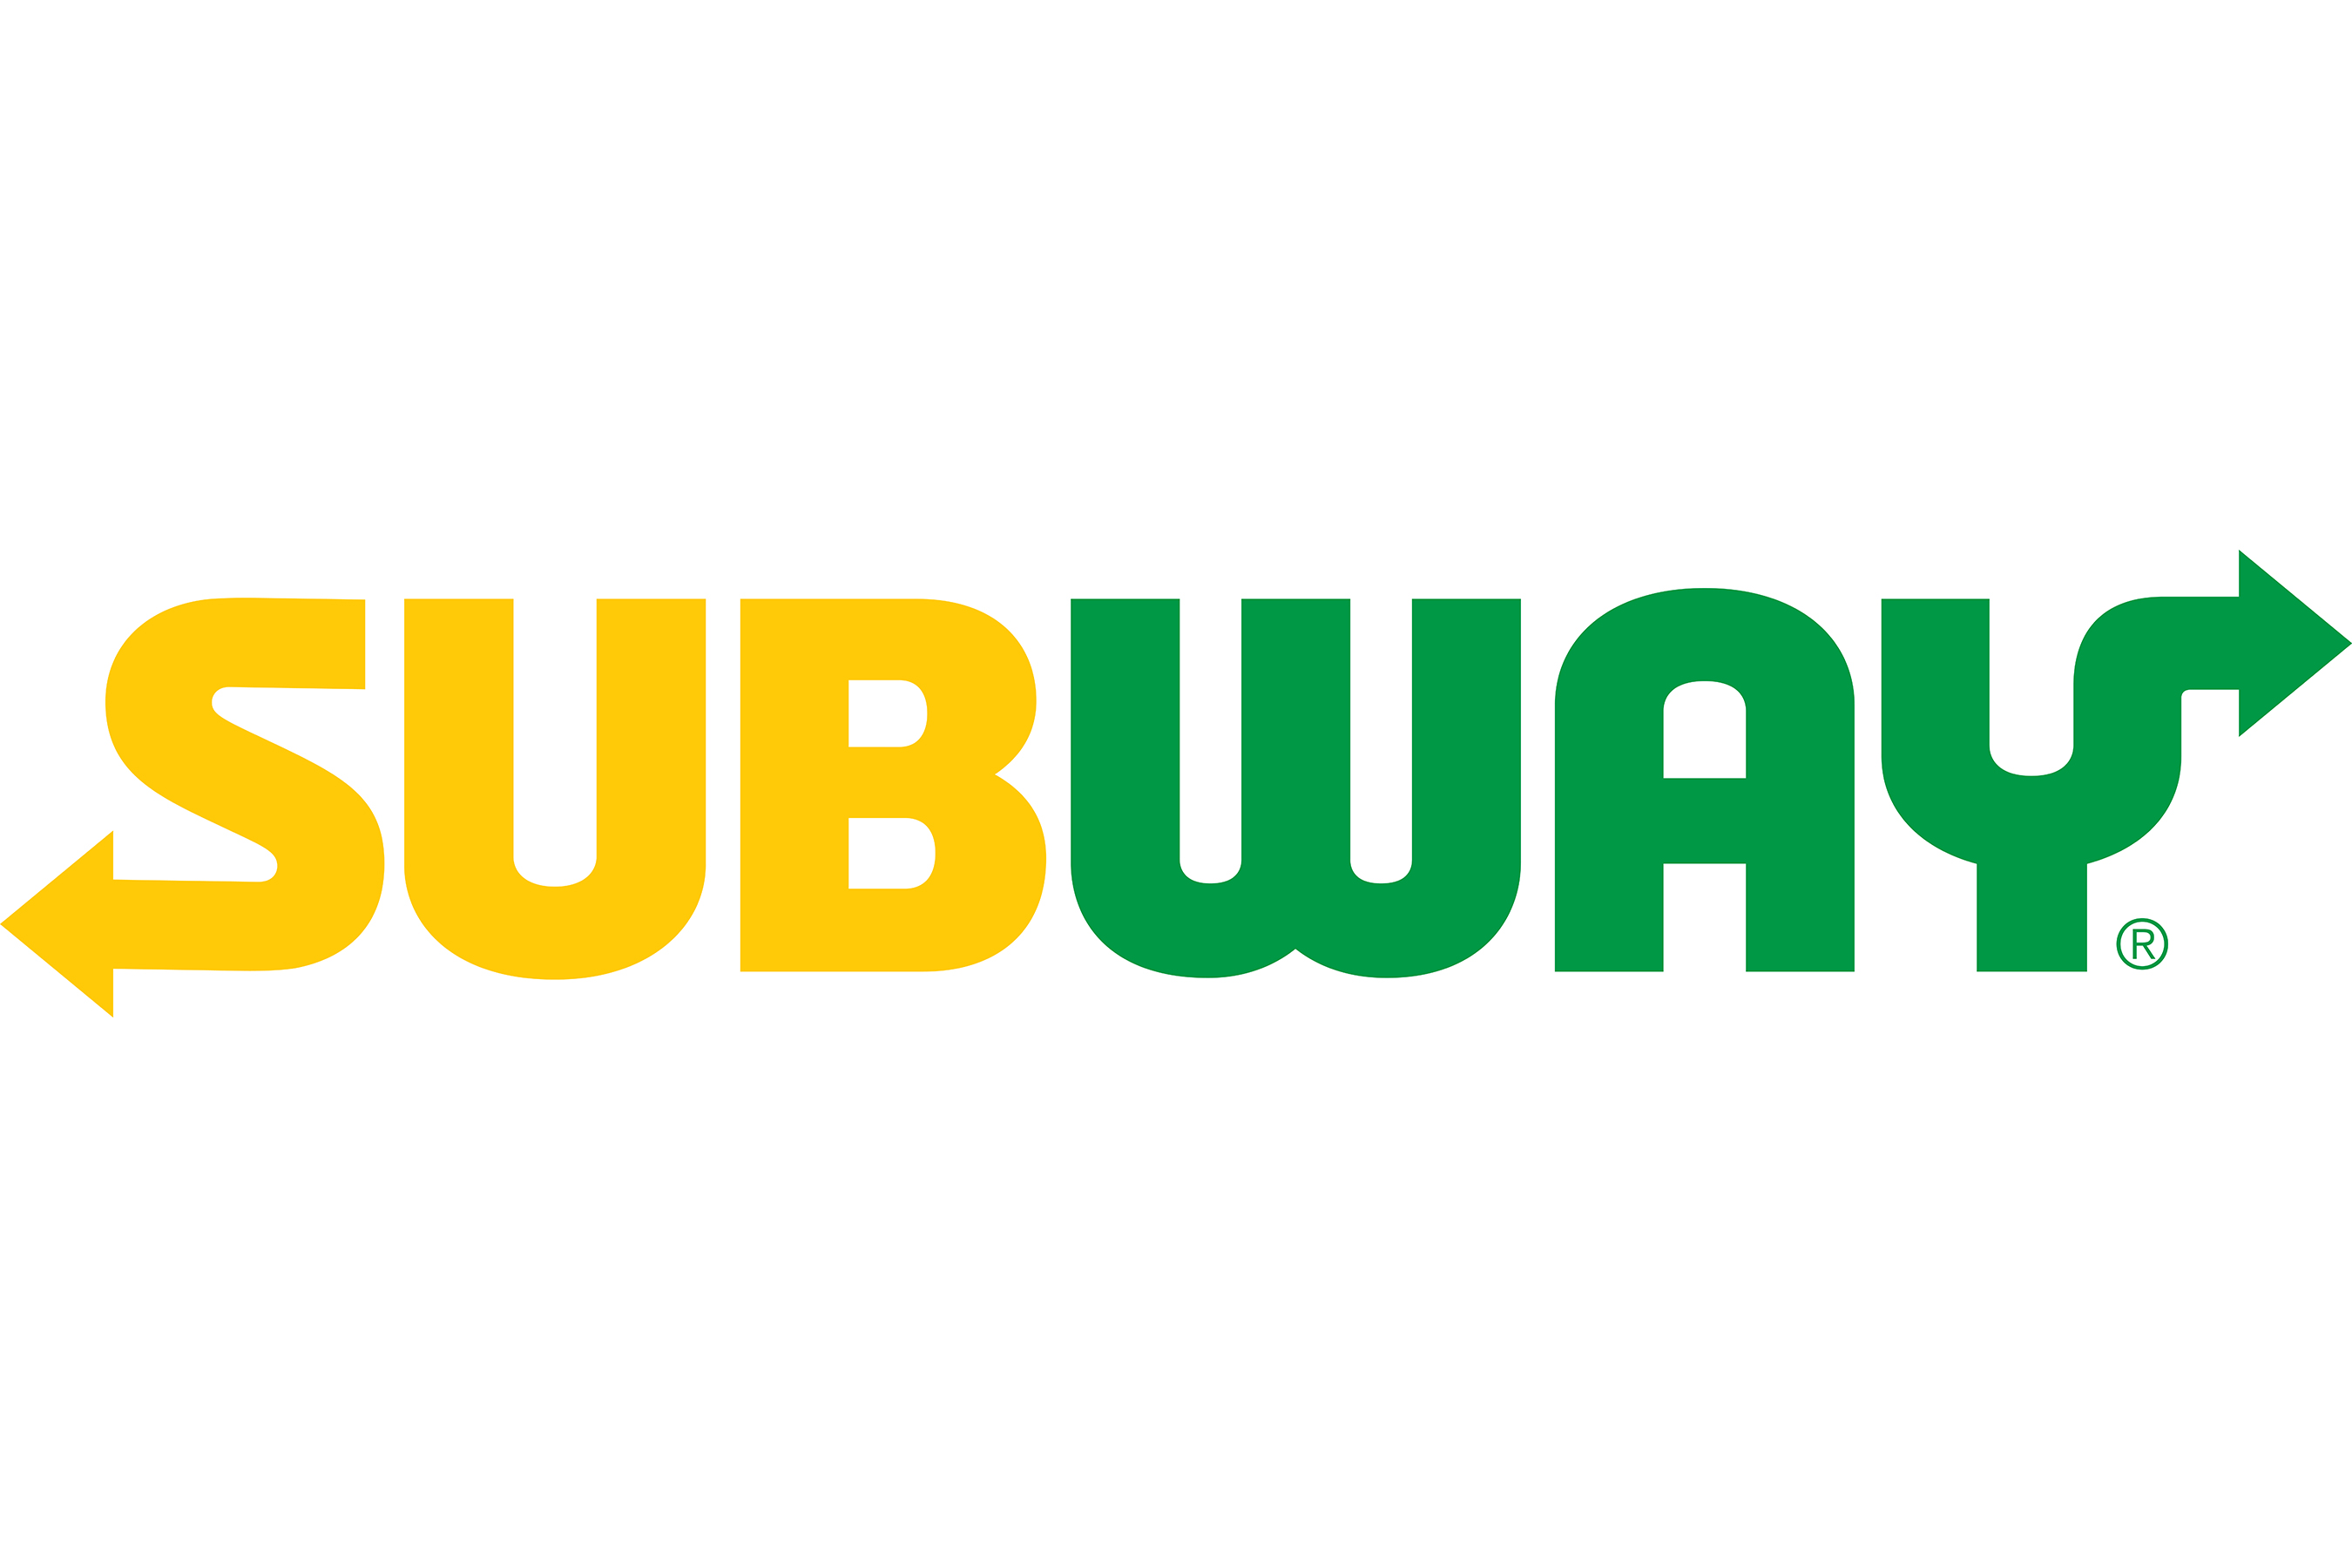 Subway brings fresh forward with new restaurant design subway brings fresh forward with new restaurant design biocorpaavc Gallery